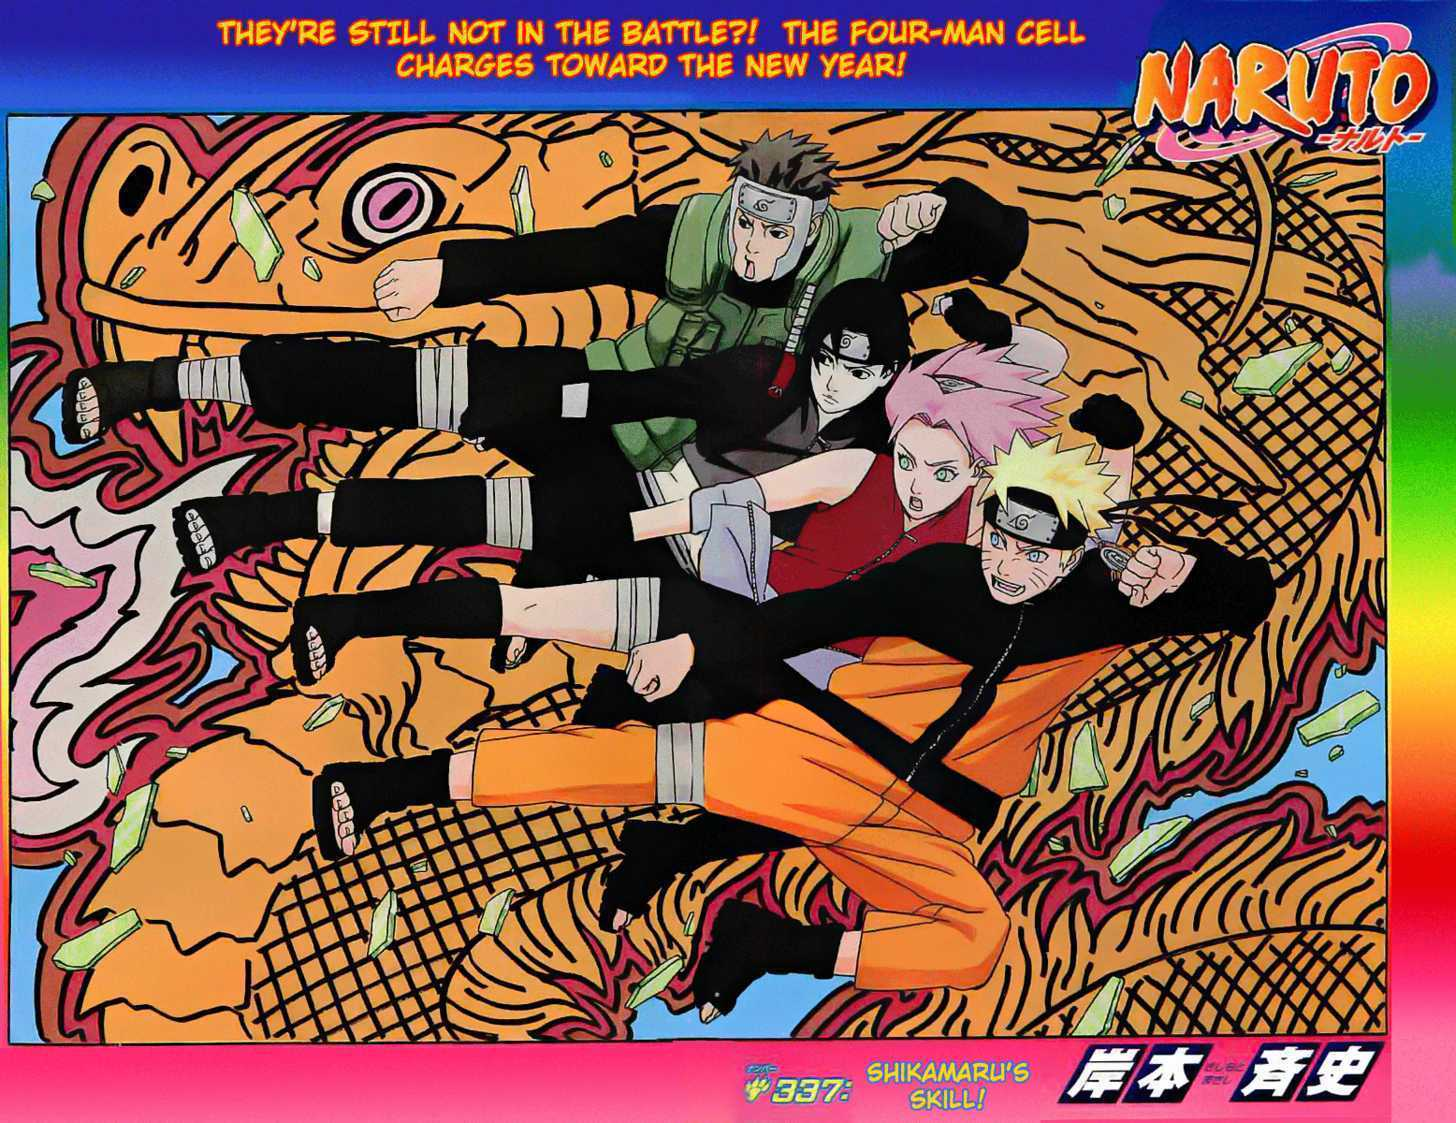 https://im.nineanime.com/comics/pic9/33/289/22704/Naruto3370980.jpg Page 1